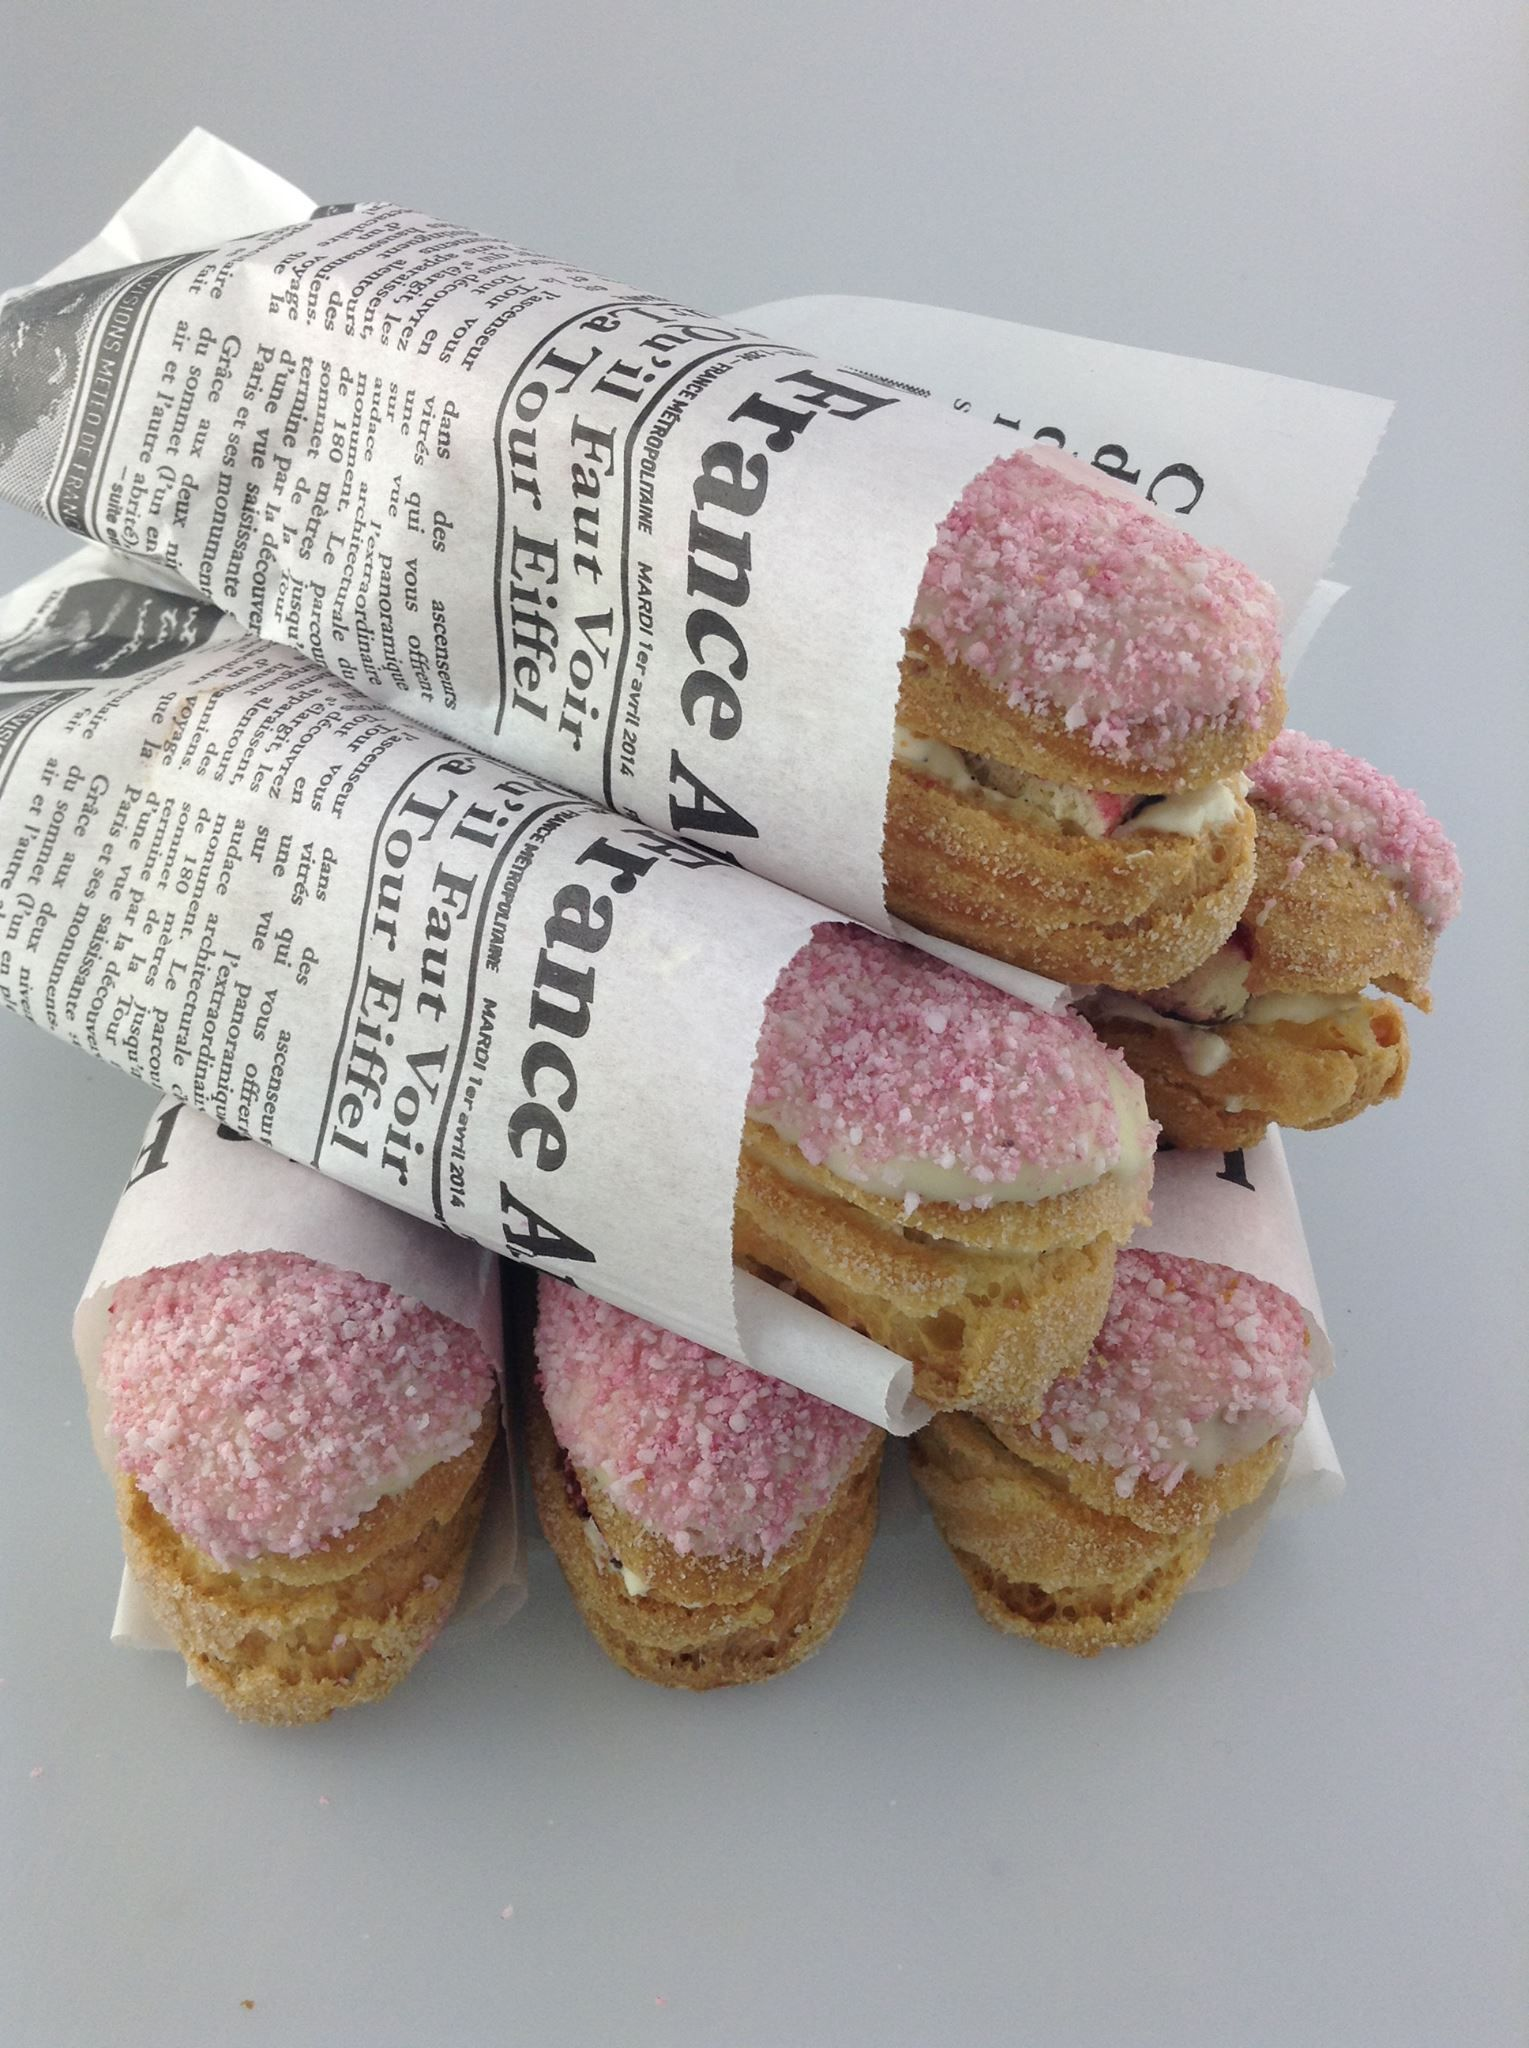 Christophe Adam's interpretation of a Lamington at his choux pastry class at Savour School! eclairs 